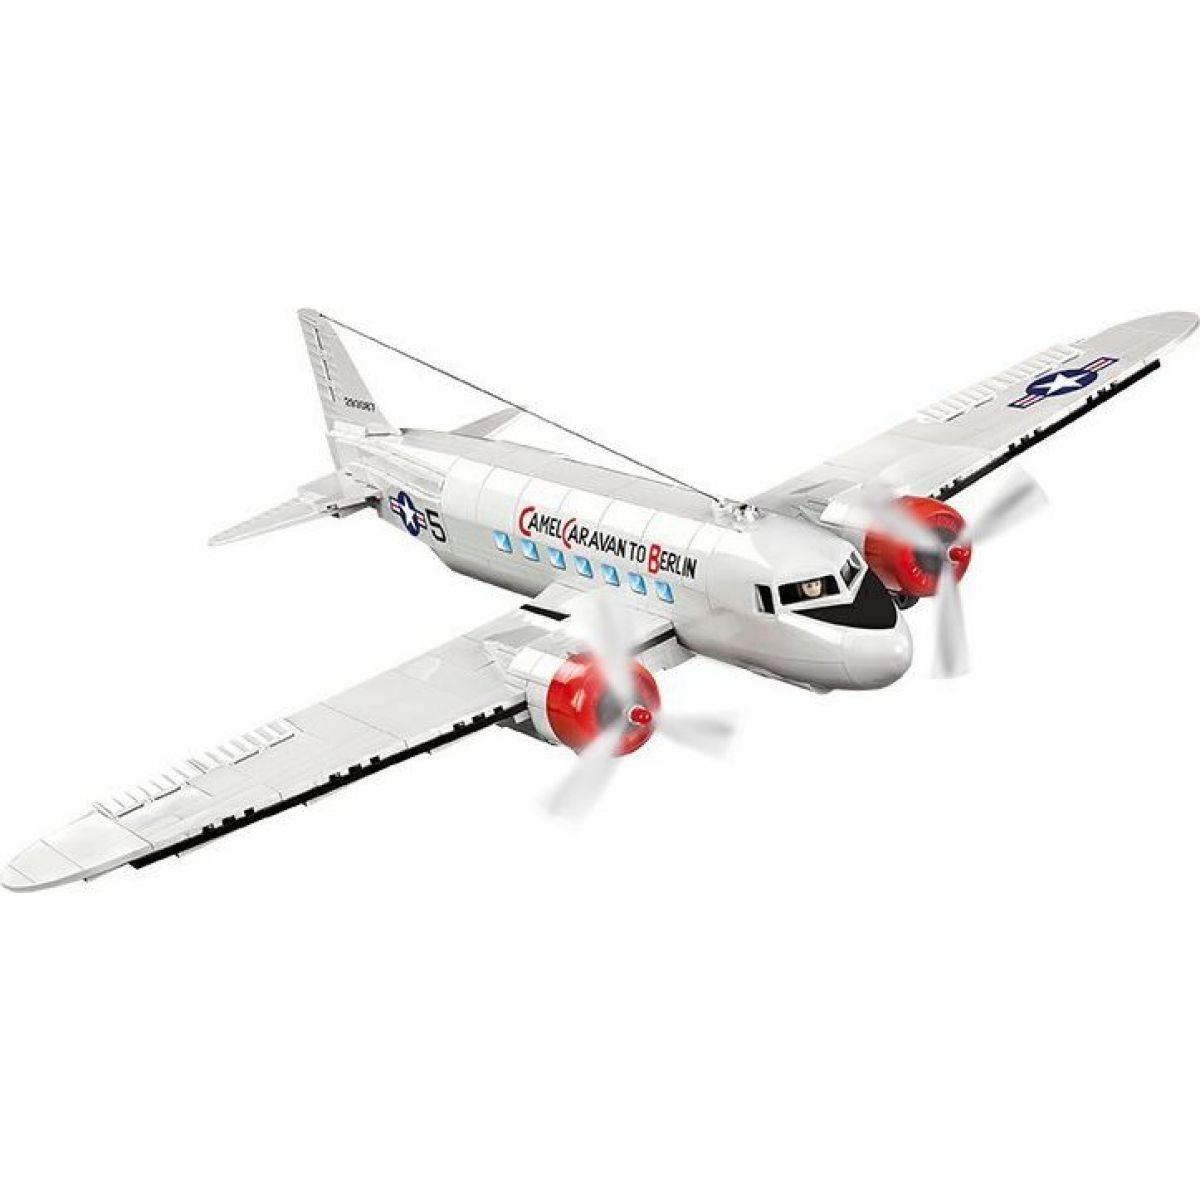 Cobi 5702 Malá armáda II. světová válka Douglas C-47 Skytrain Dakota Berlin Airlift